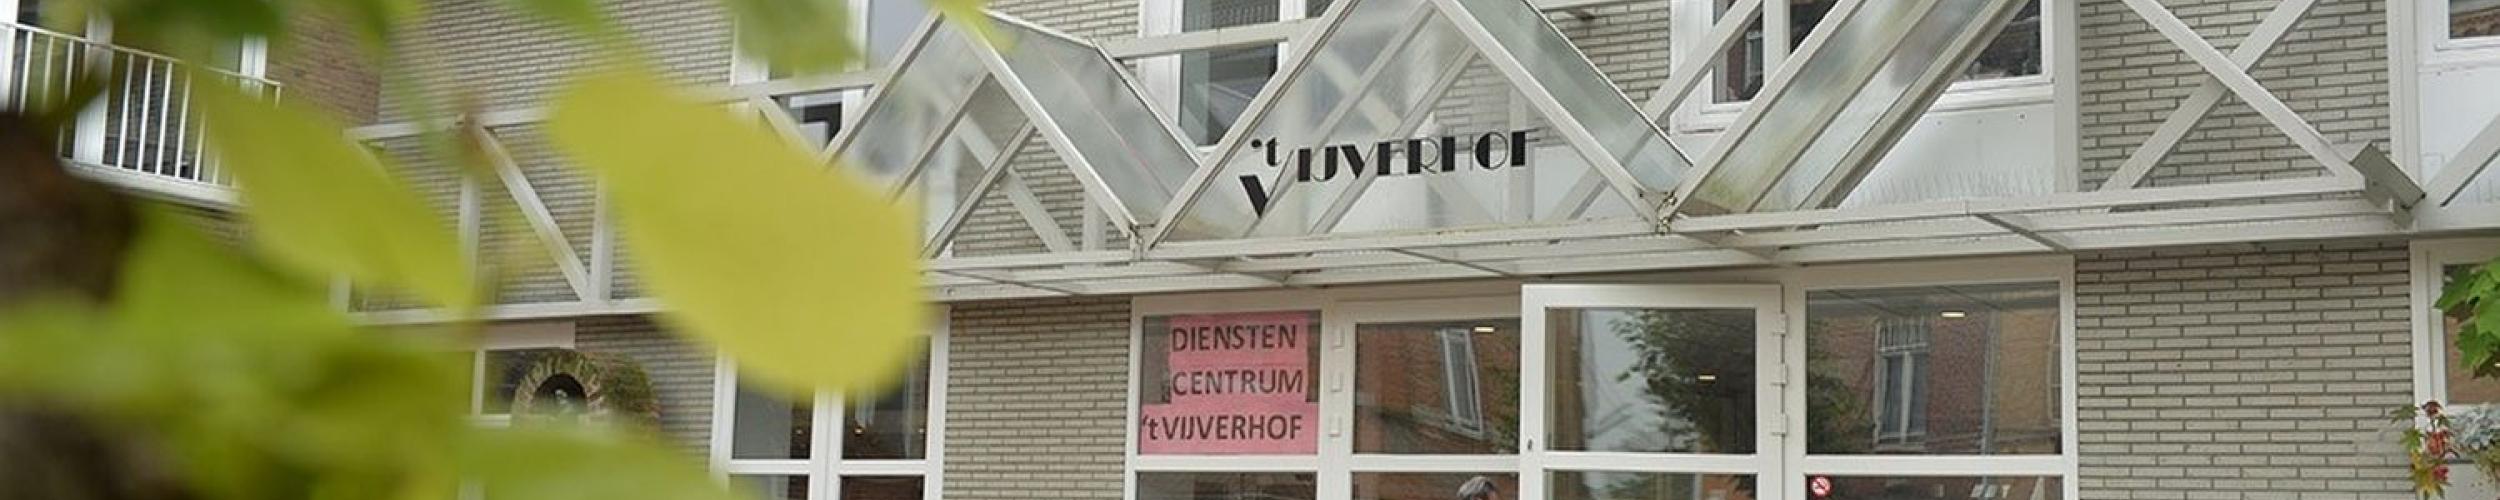 contact DC 't Vijverhof